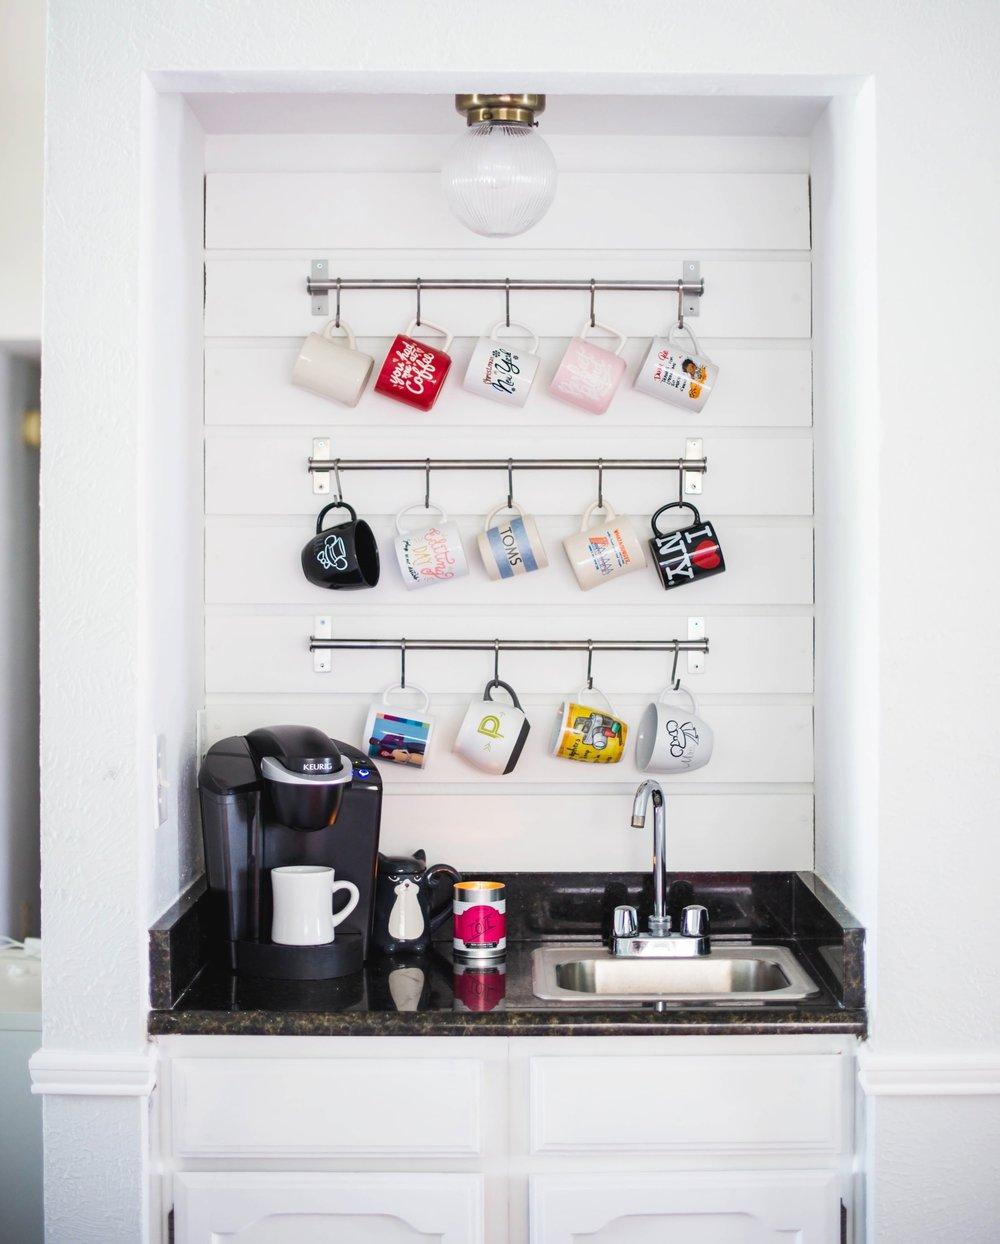 Living Room Coffee Bar with Hanging Mugs